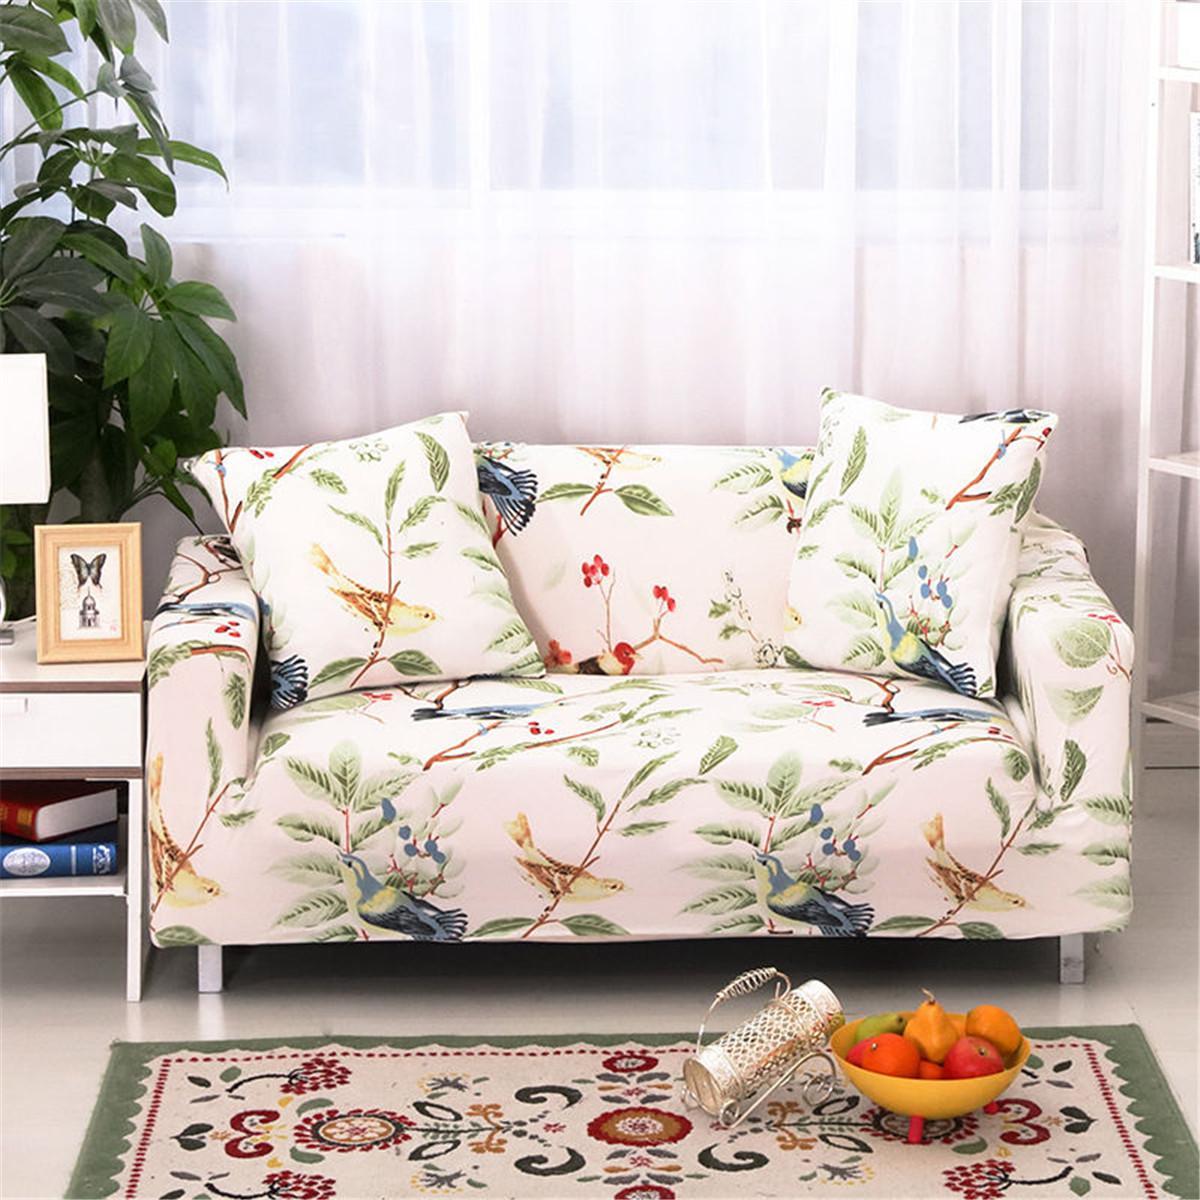 Brilliant Bird Furniture Protector Loveseat Stretch Elastic Slipcover Sofa Couch Cover Spiritservingveterans Wood Chair Design Ideas Spiritservingveteransorg